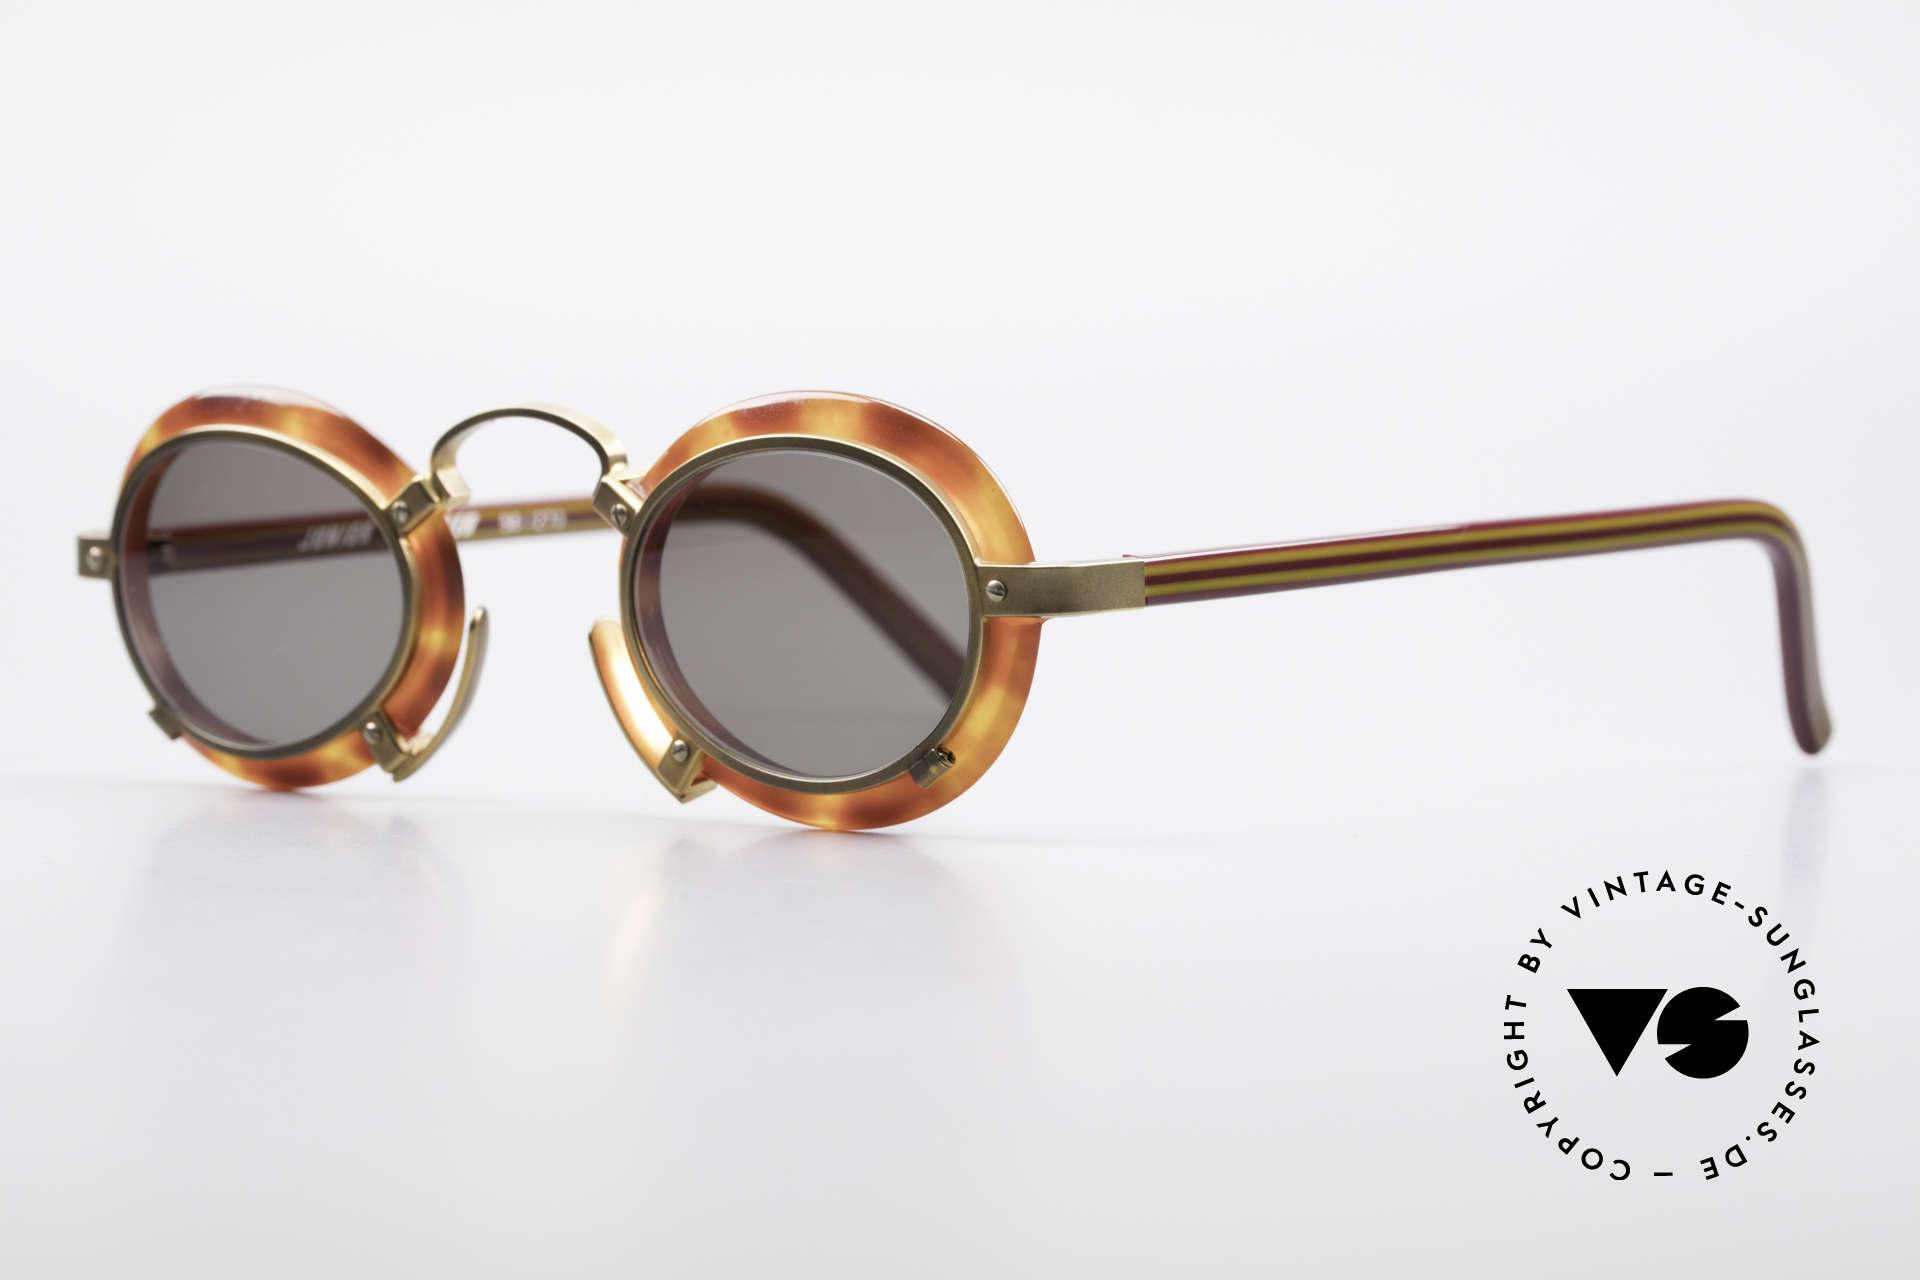 Jean Paul Gaultier 58-1273 Designer Sunglasses JPG 90's, great model from the JUNIOR GAULTIER series, Made for Men and Women